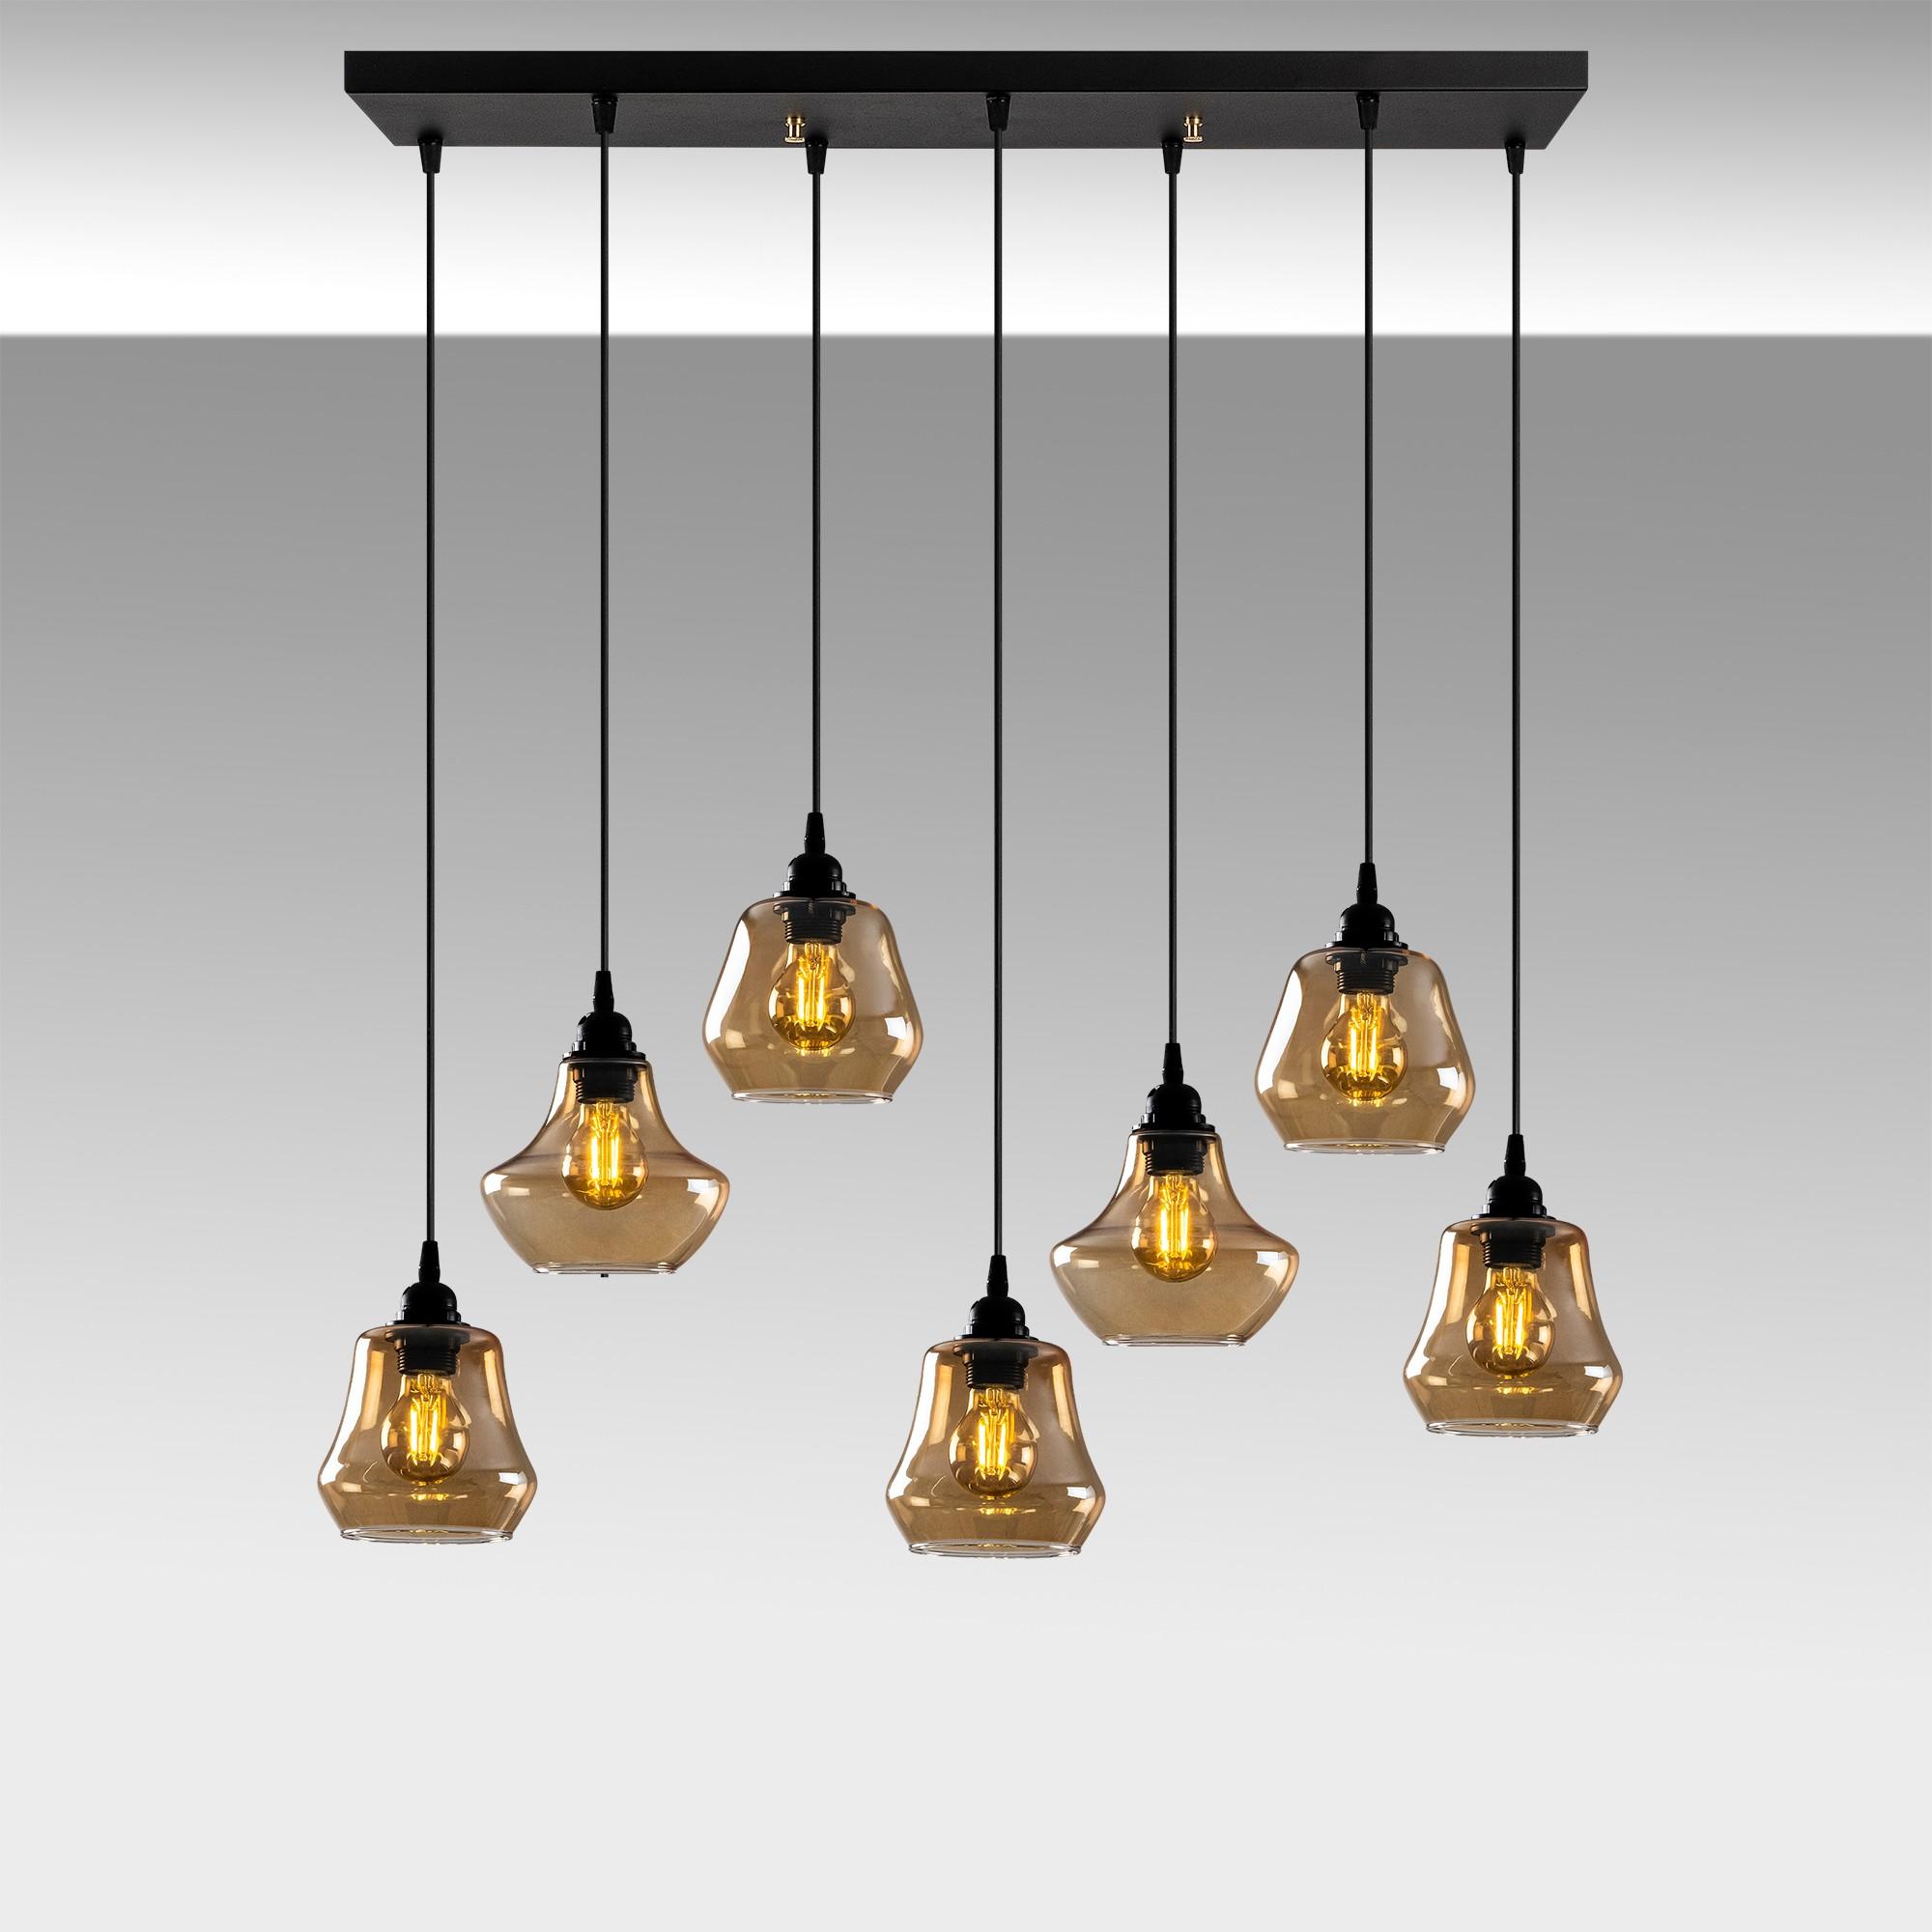 Hanglamp langwerpig modern, gouden glas E27 fitting 7 x - sfeerfoto